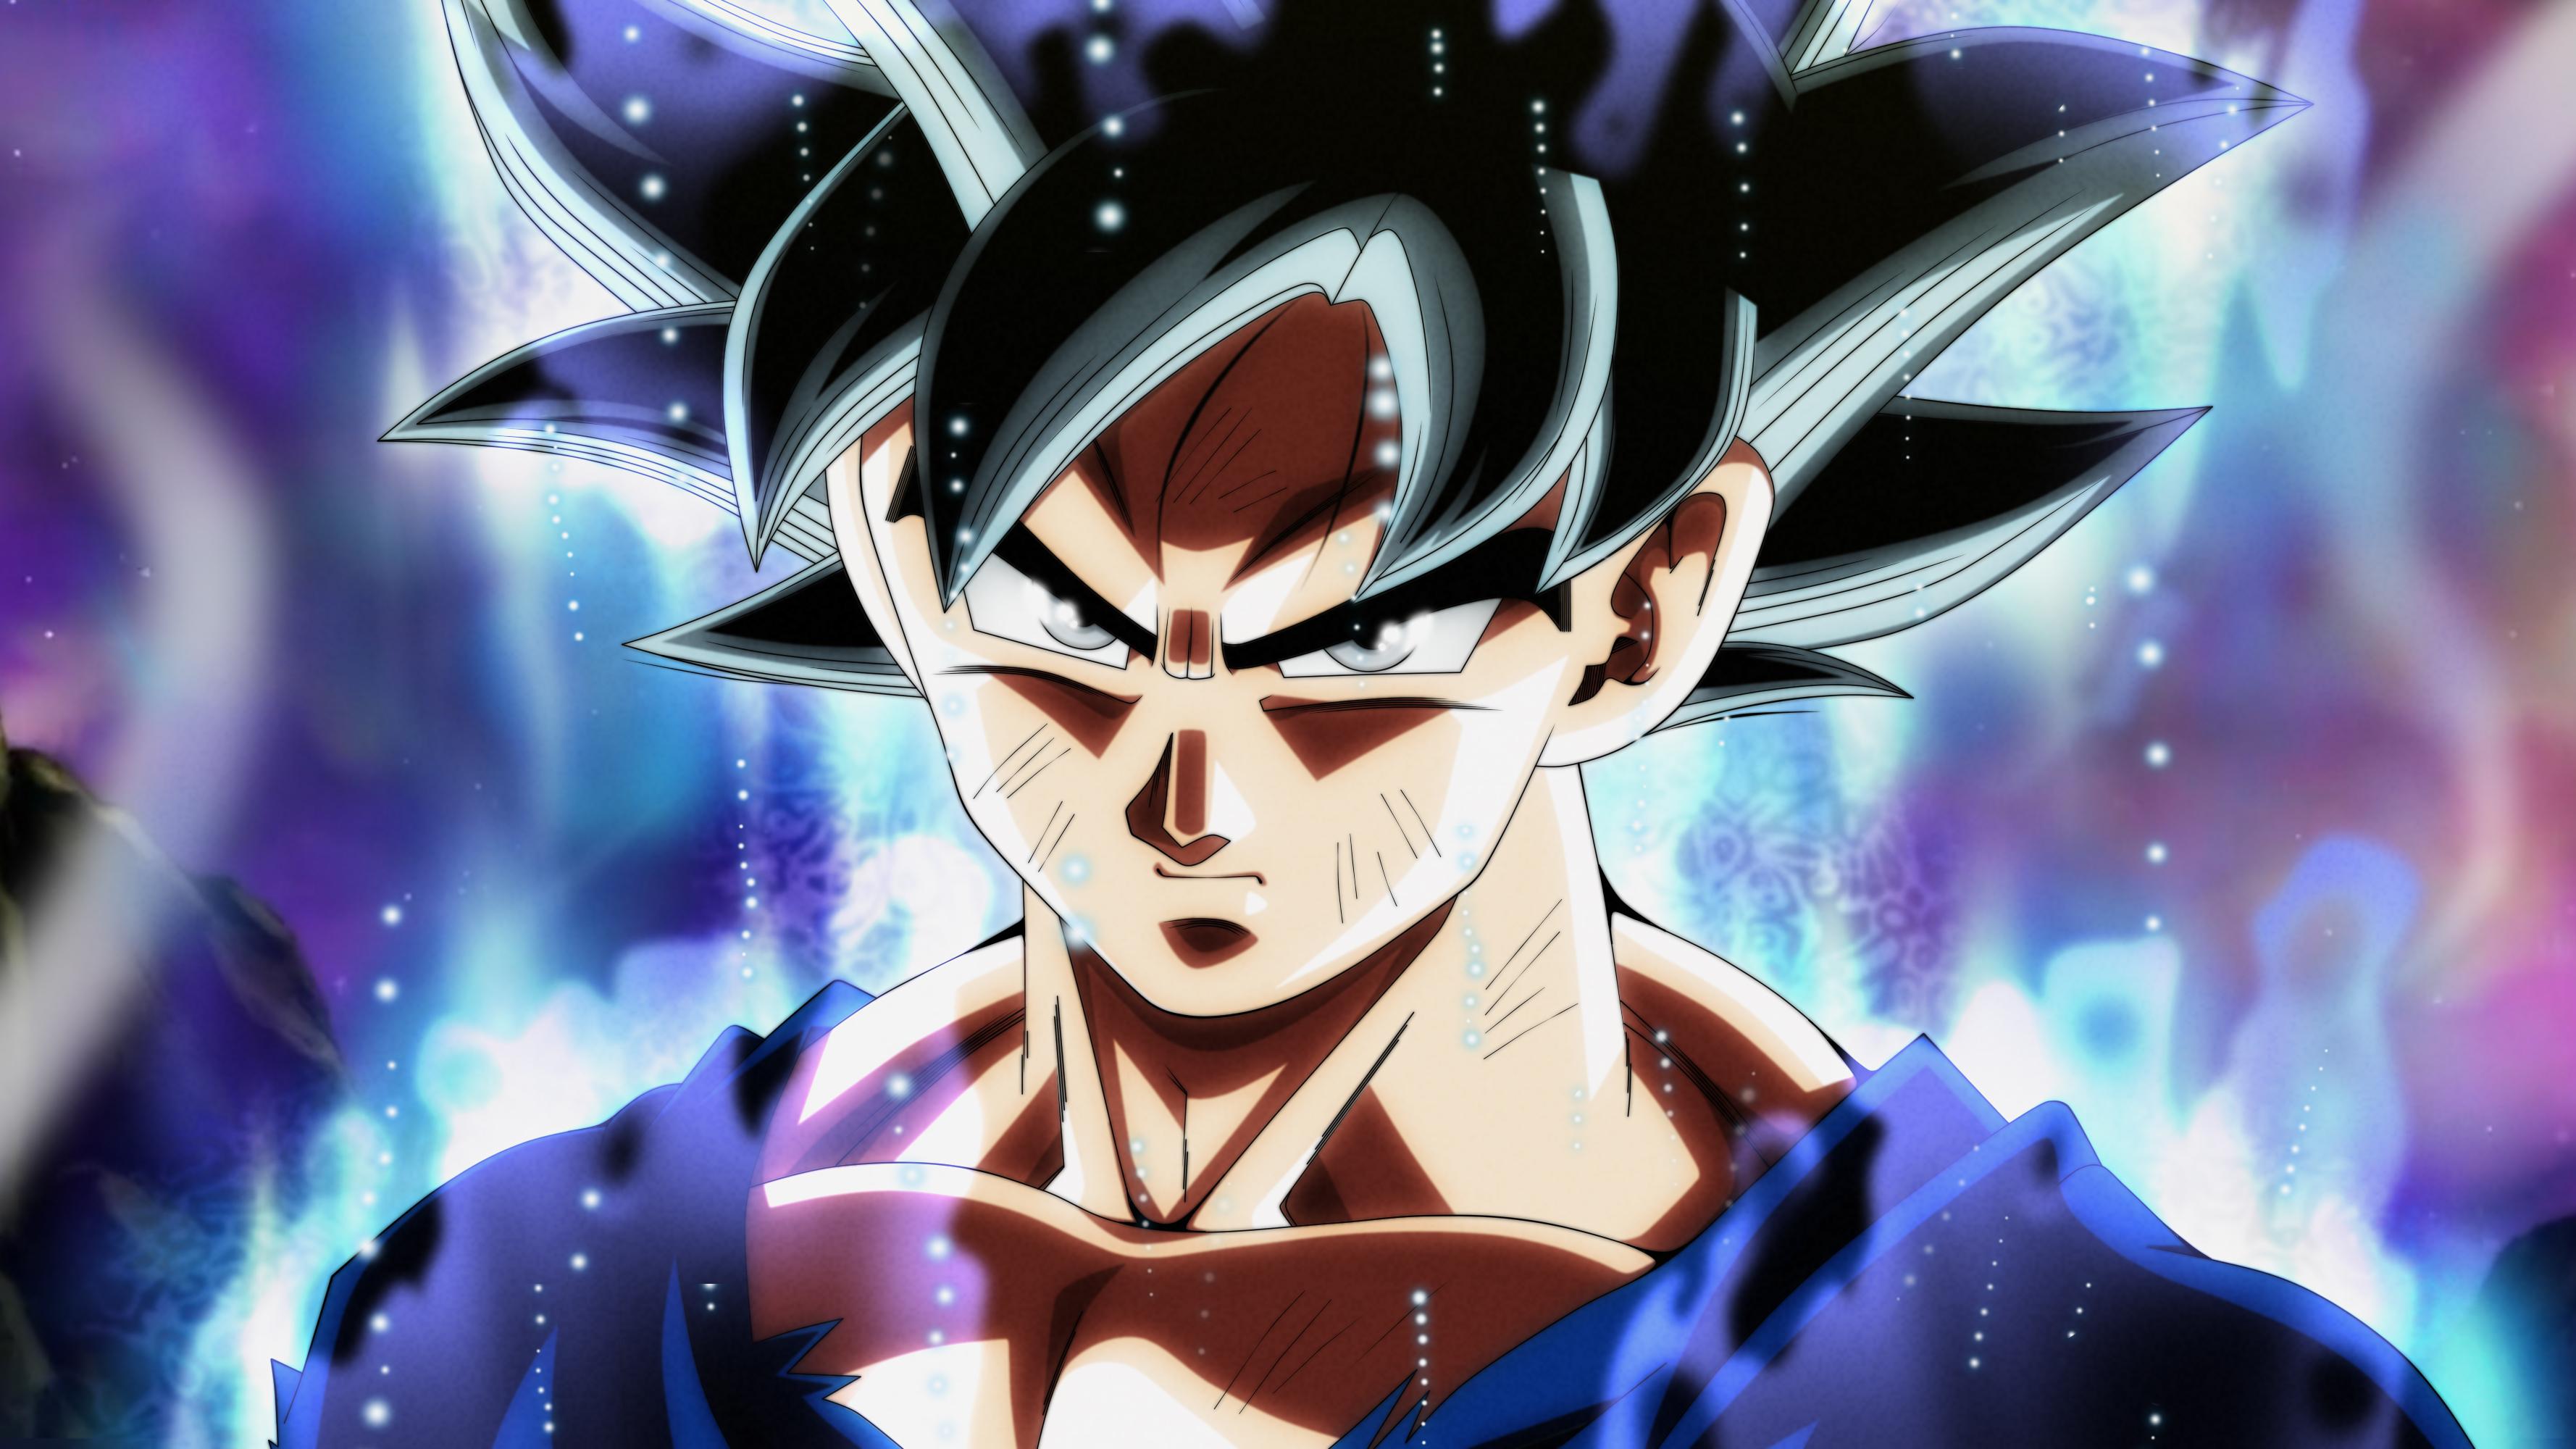 Ultra Instinct Dragon Ball Super, HD Anime, 4k Wallpapers